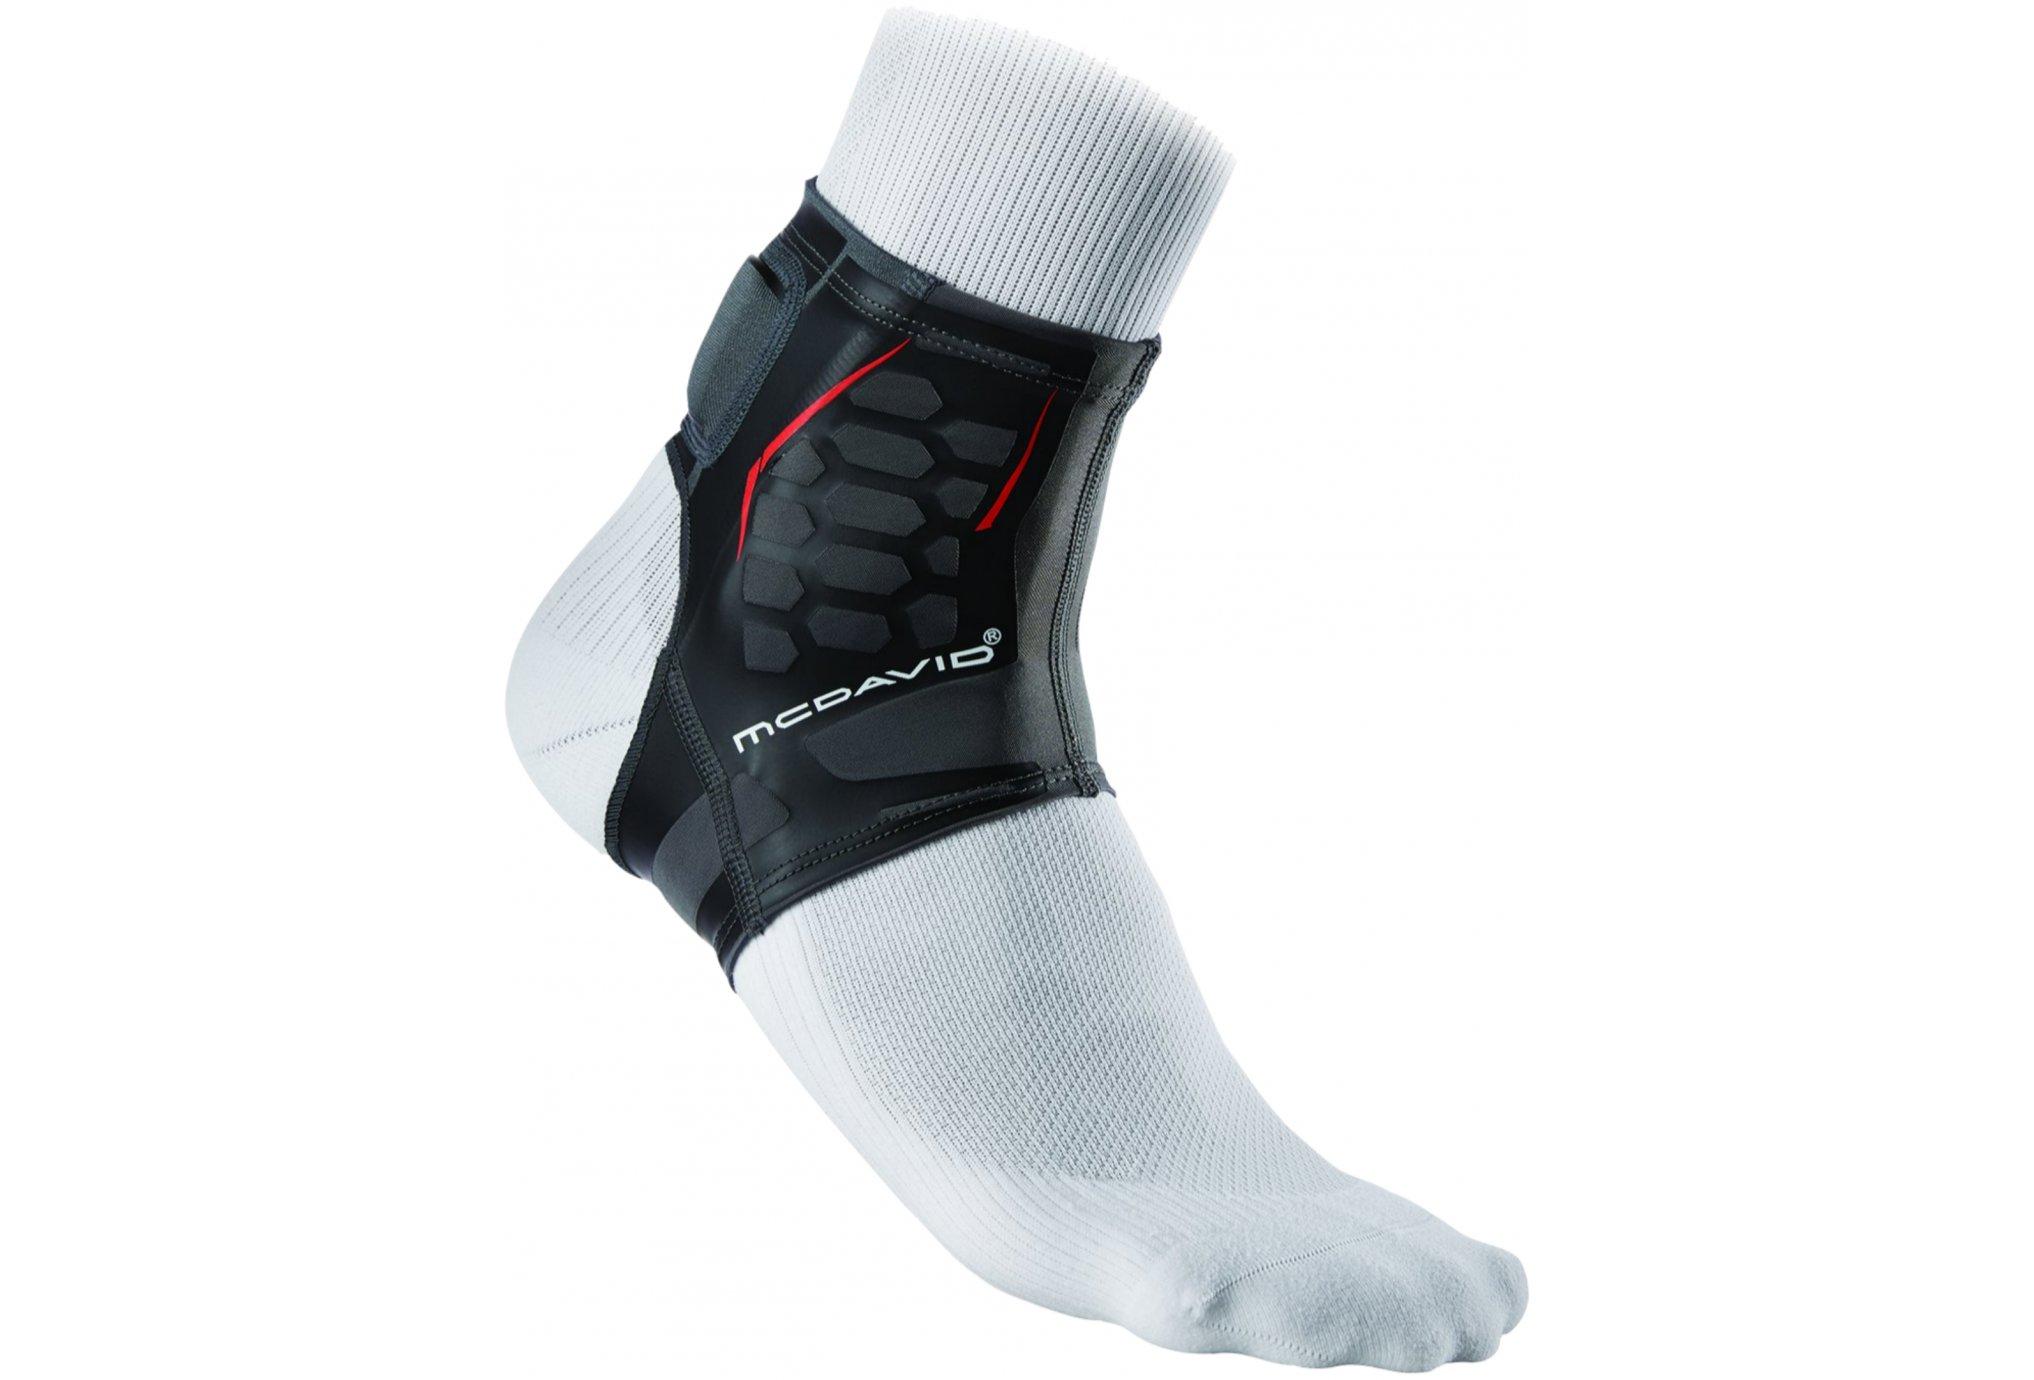 McDavid Compression pour tendon d'Achille Protection musculaire & articulaire